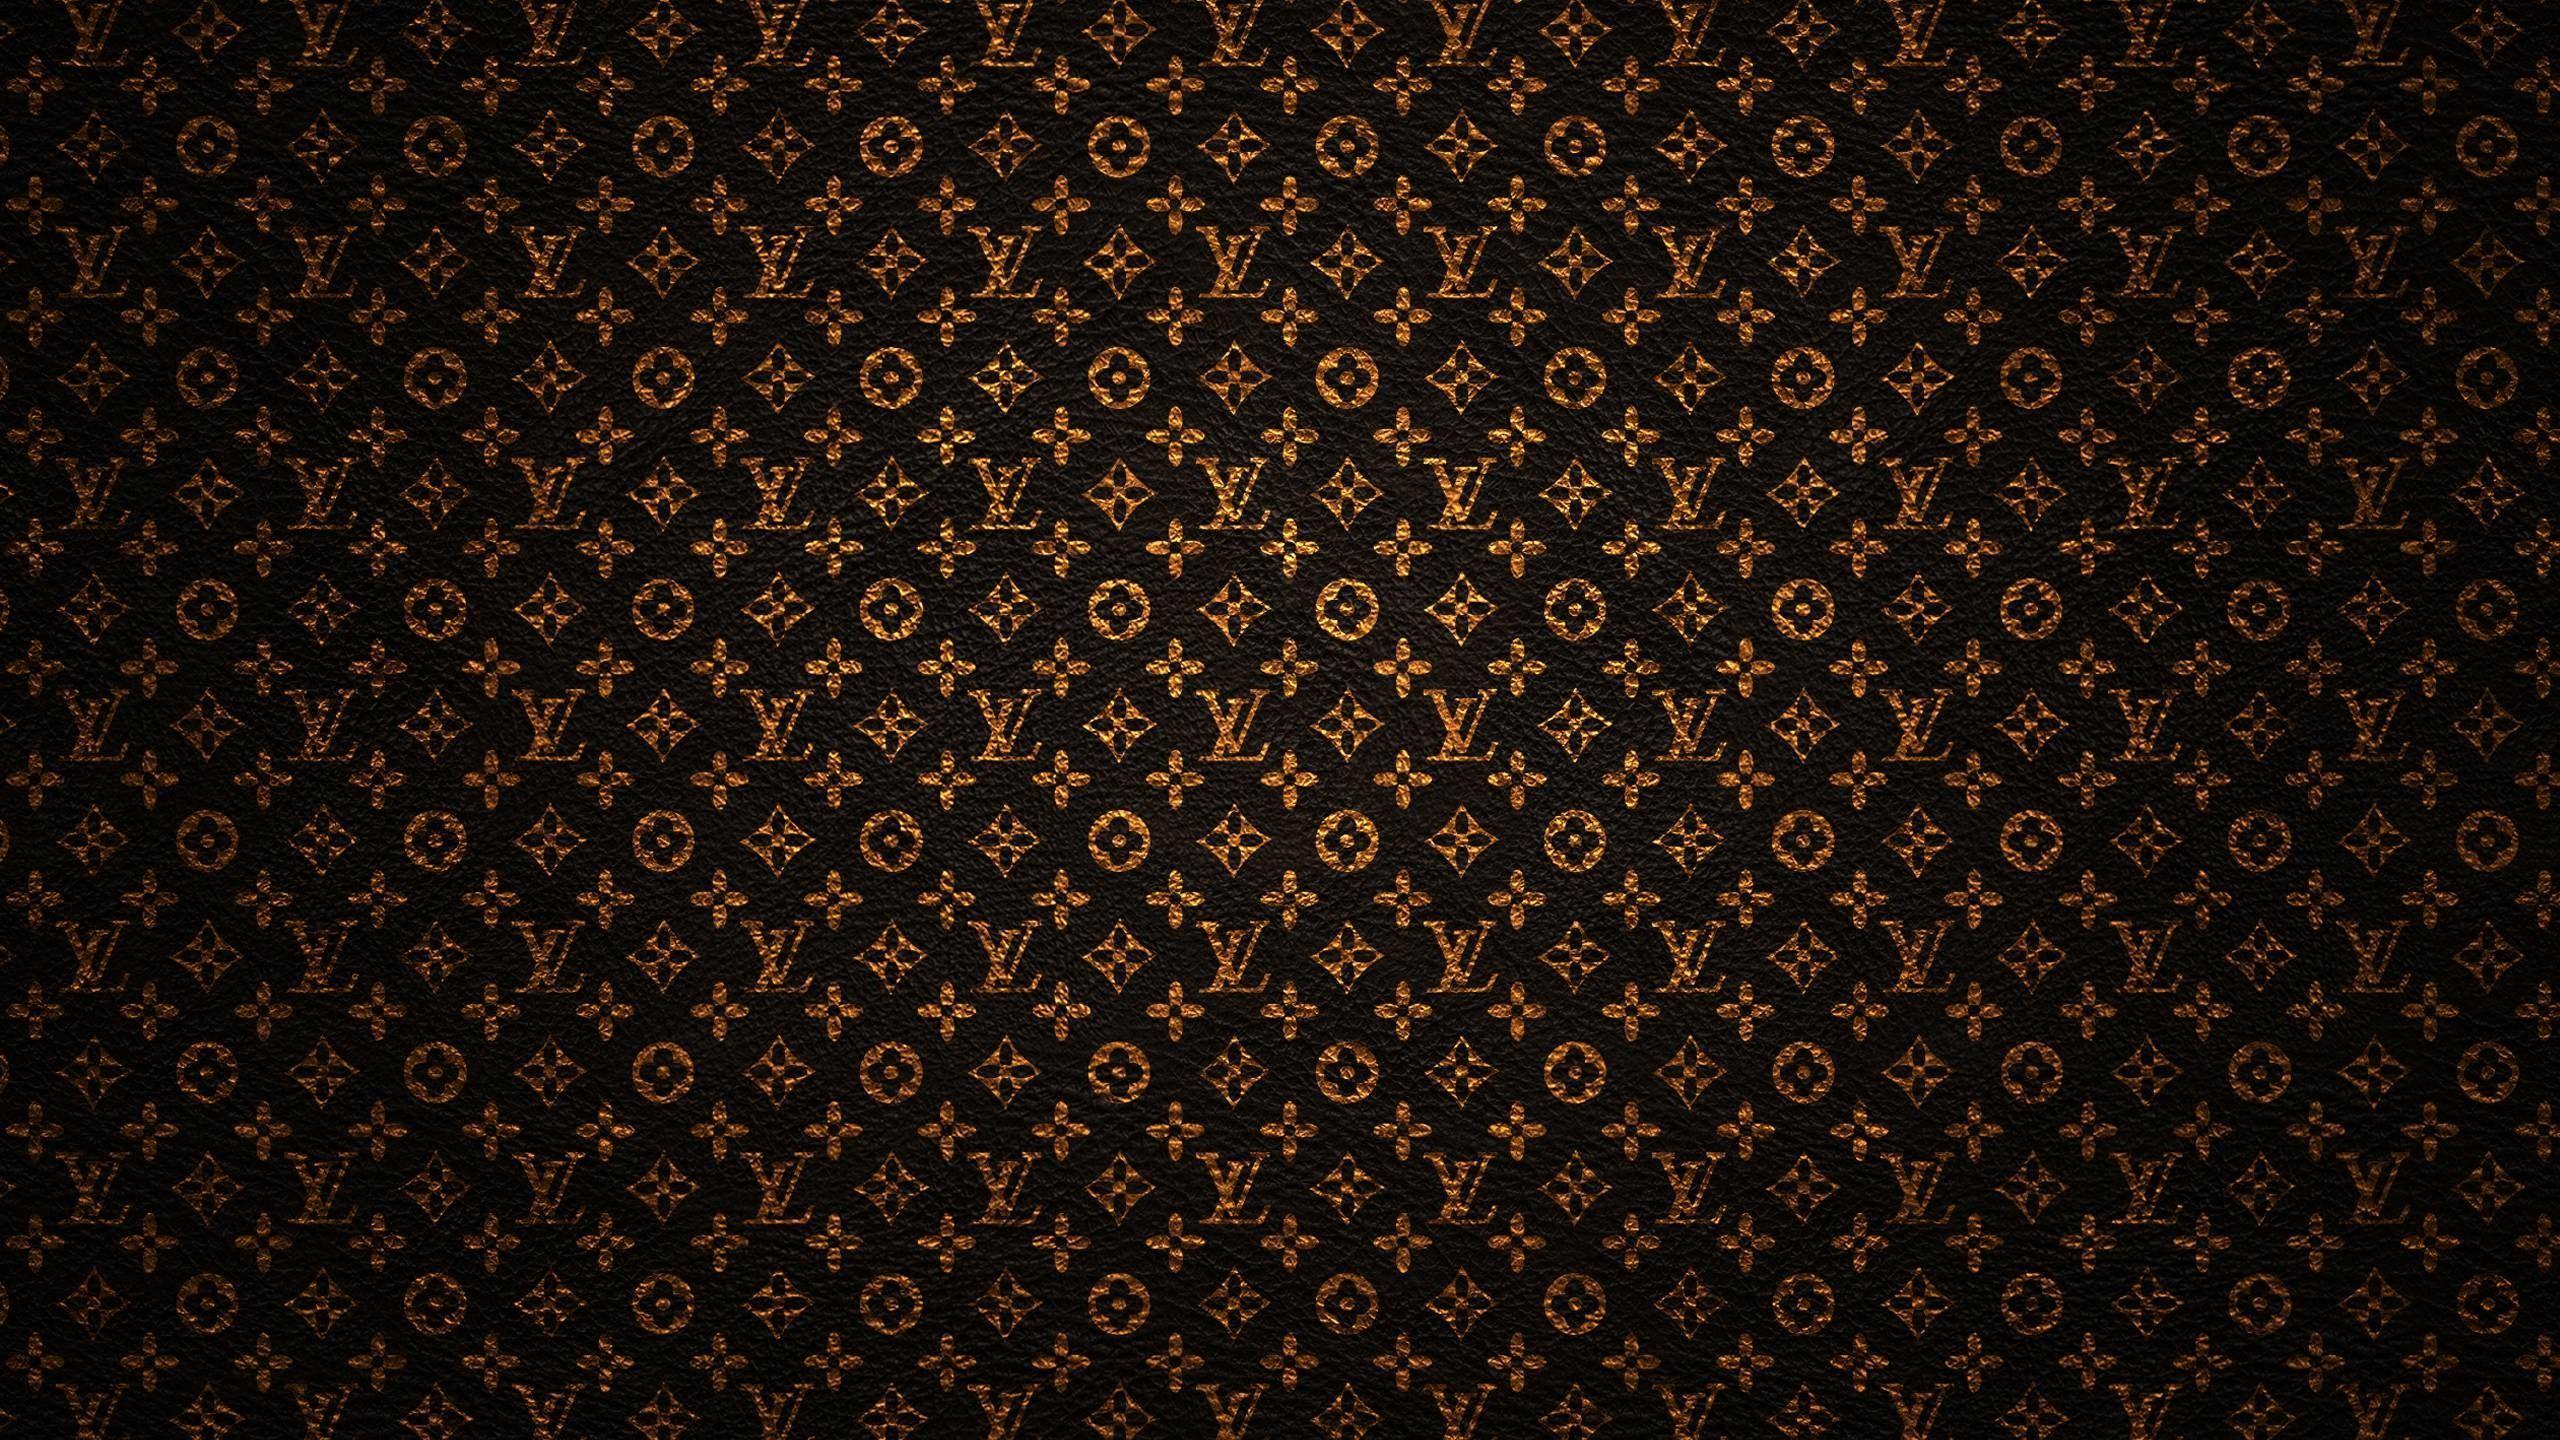 Supreme Louis Vuitton Wallpapers Top Free Supreme Louis Vuitton